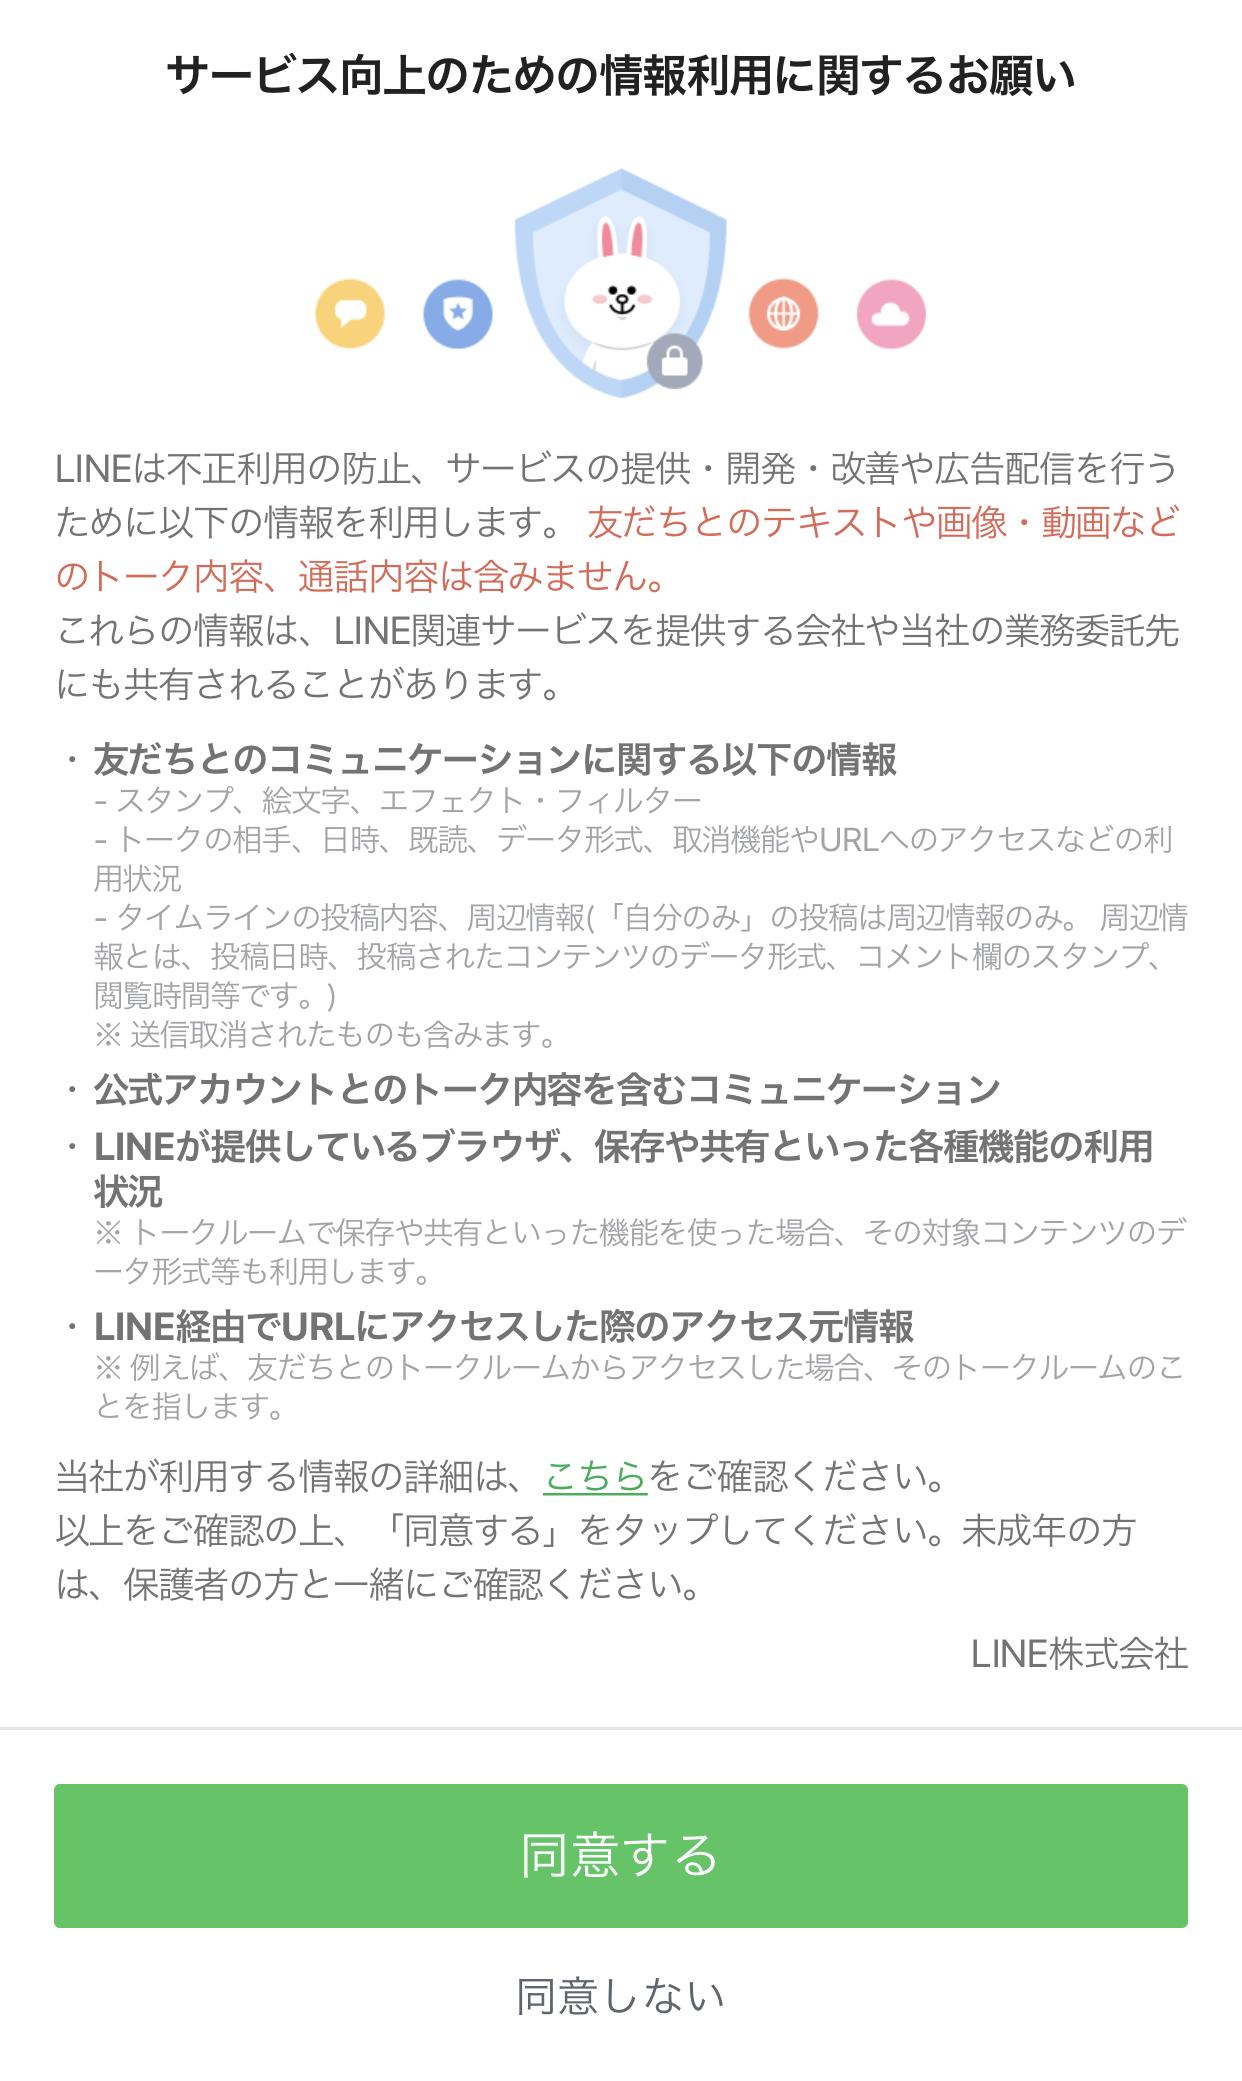 LINEsyoudaku.png